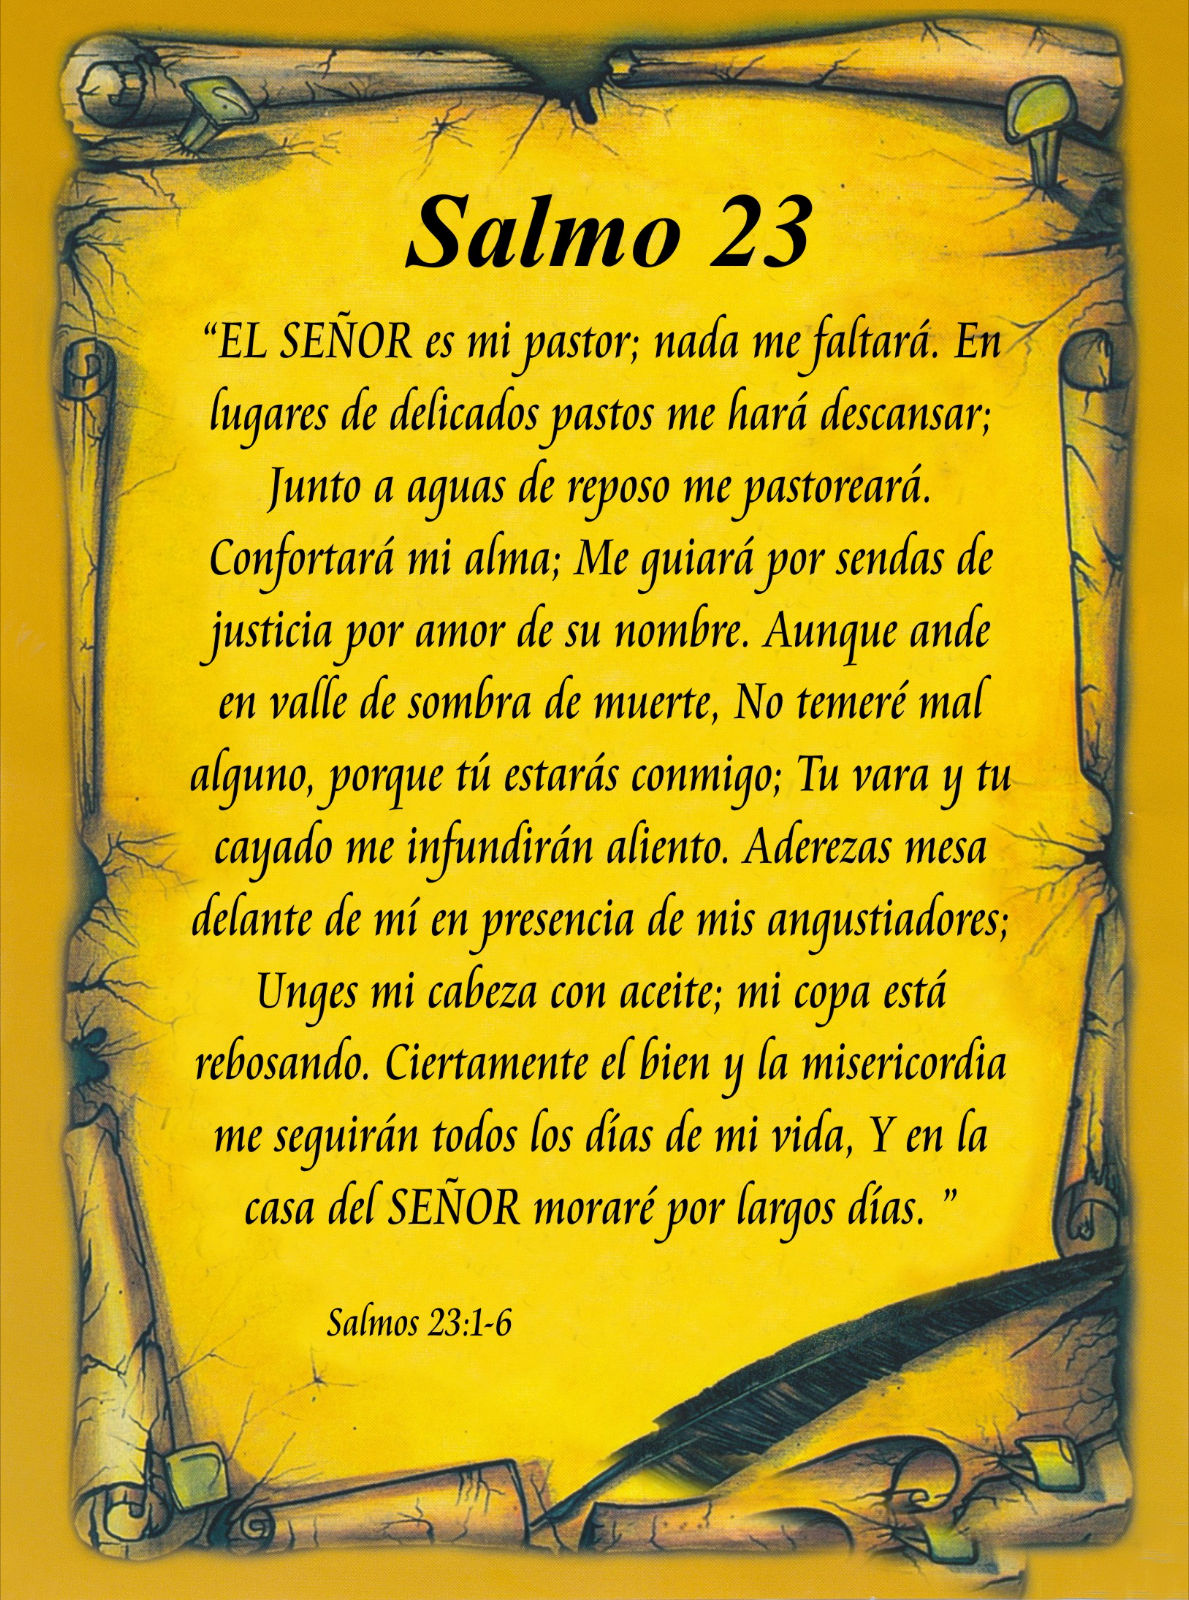 salmo - photo #30